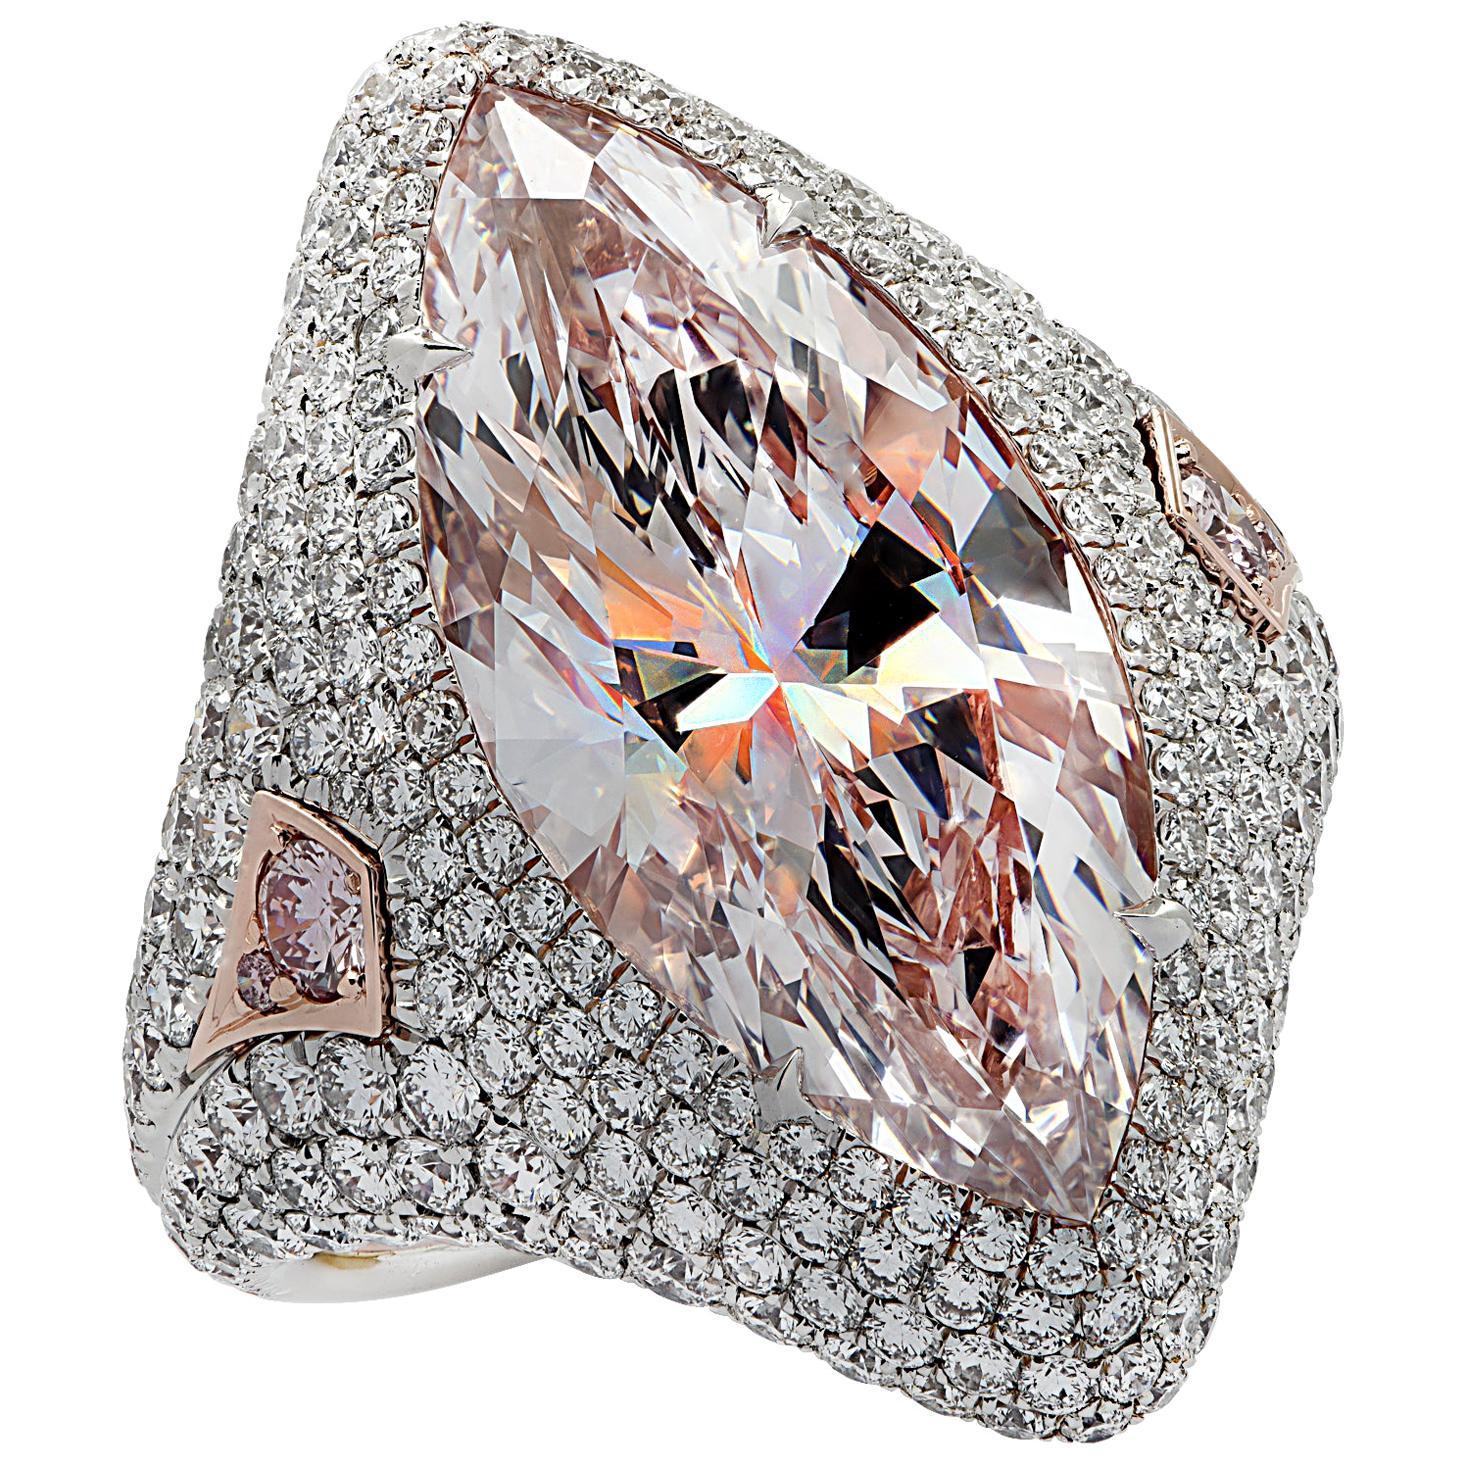 Vivid Diamonds GIA Certified 9.97 Carat Pink Marquise Cut Diamond Ring